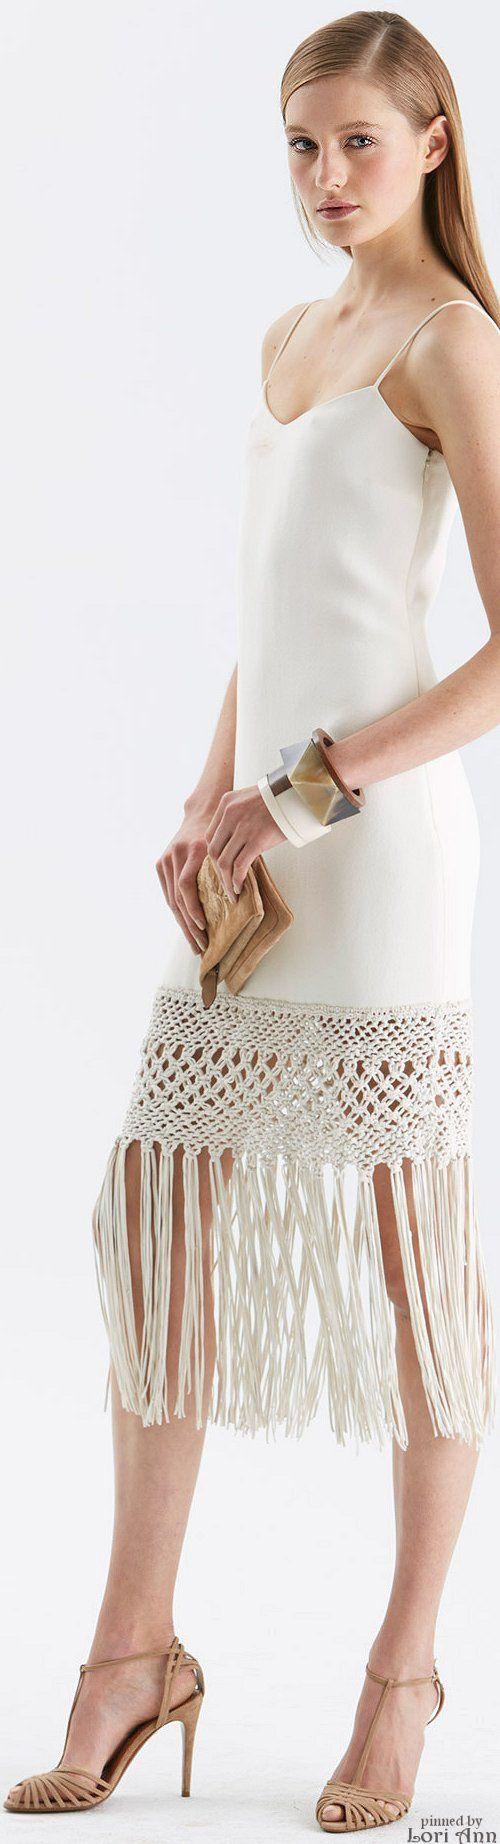 9723 best Dresses images on Pinterest | Feminine fashion, Woman ...